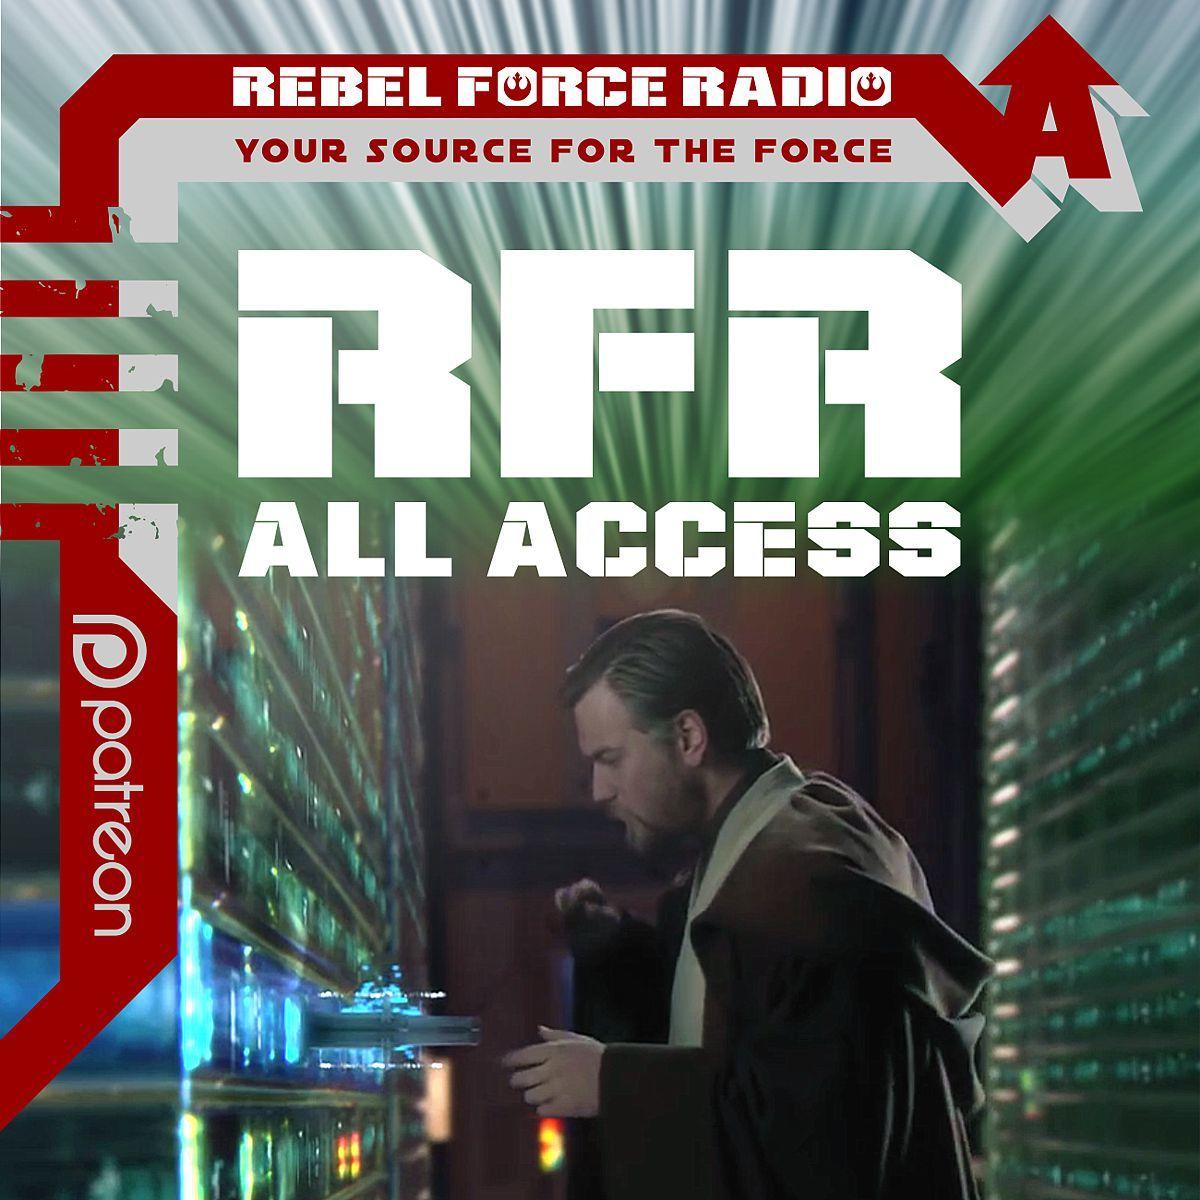 RFRAllAccess.jpg